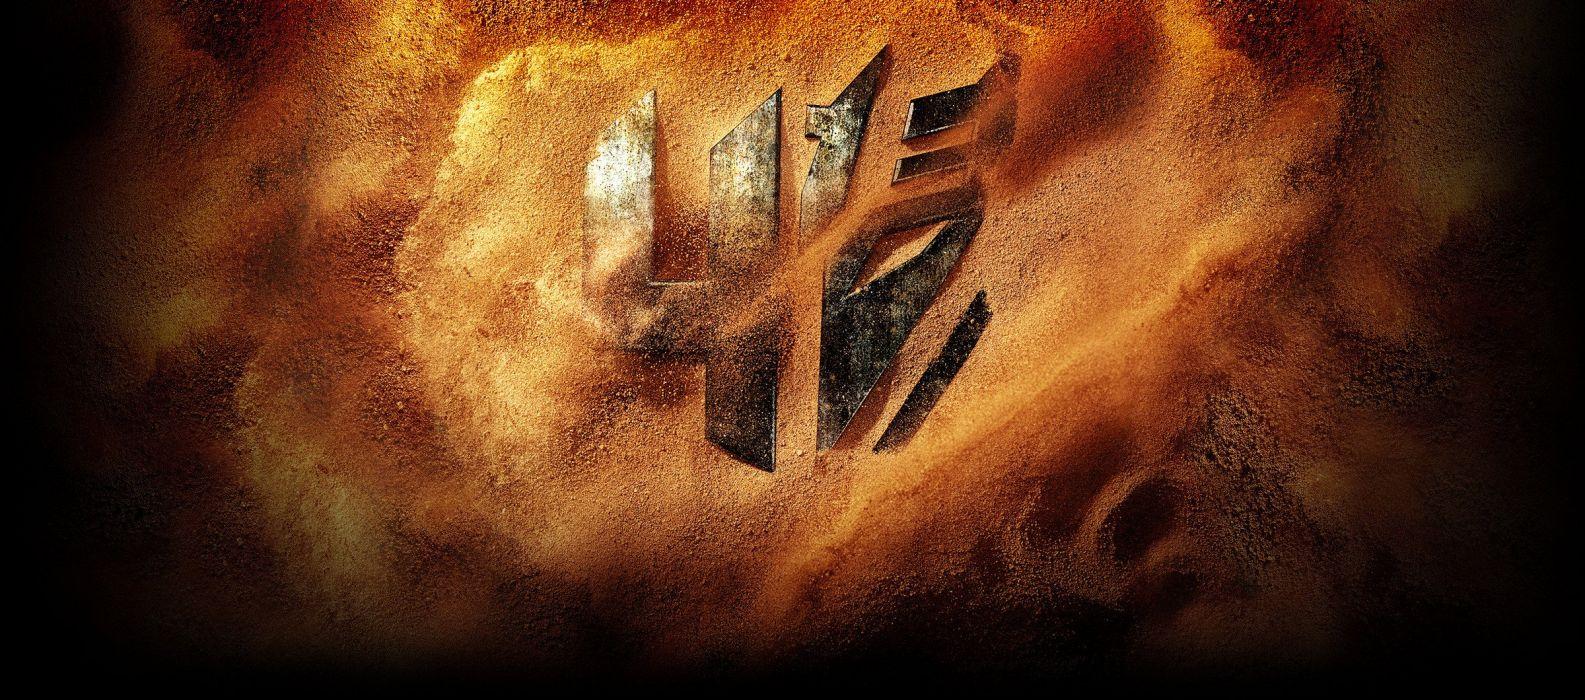 TRANSFORMERS AGE EXTINCTION action adventure sci-fi mecha (66) wallpaper